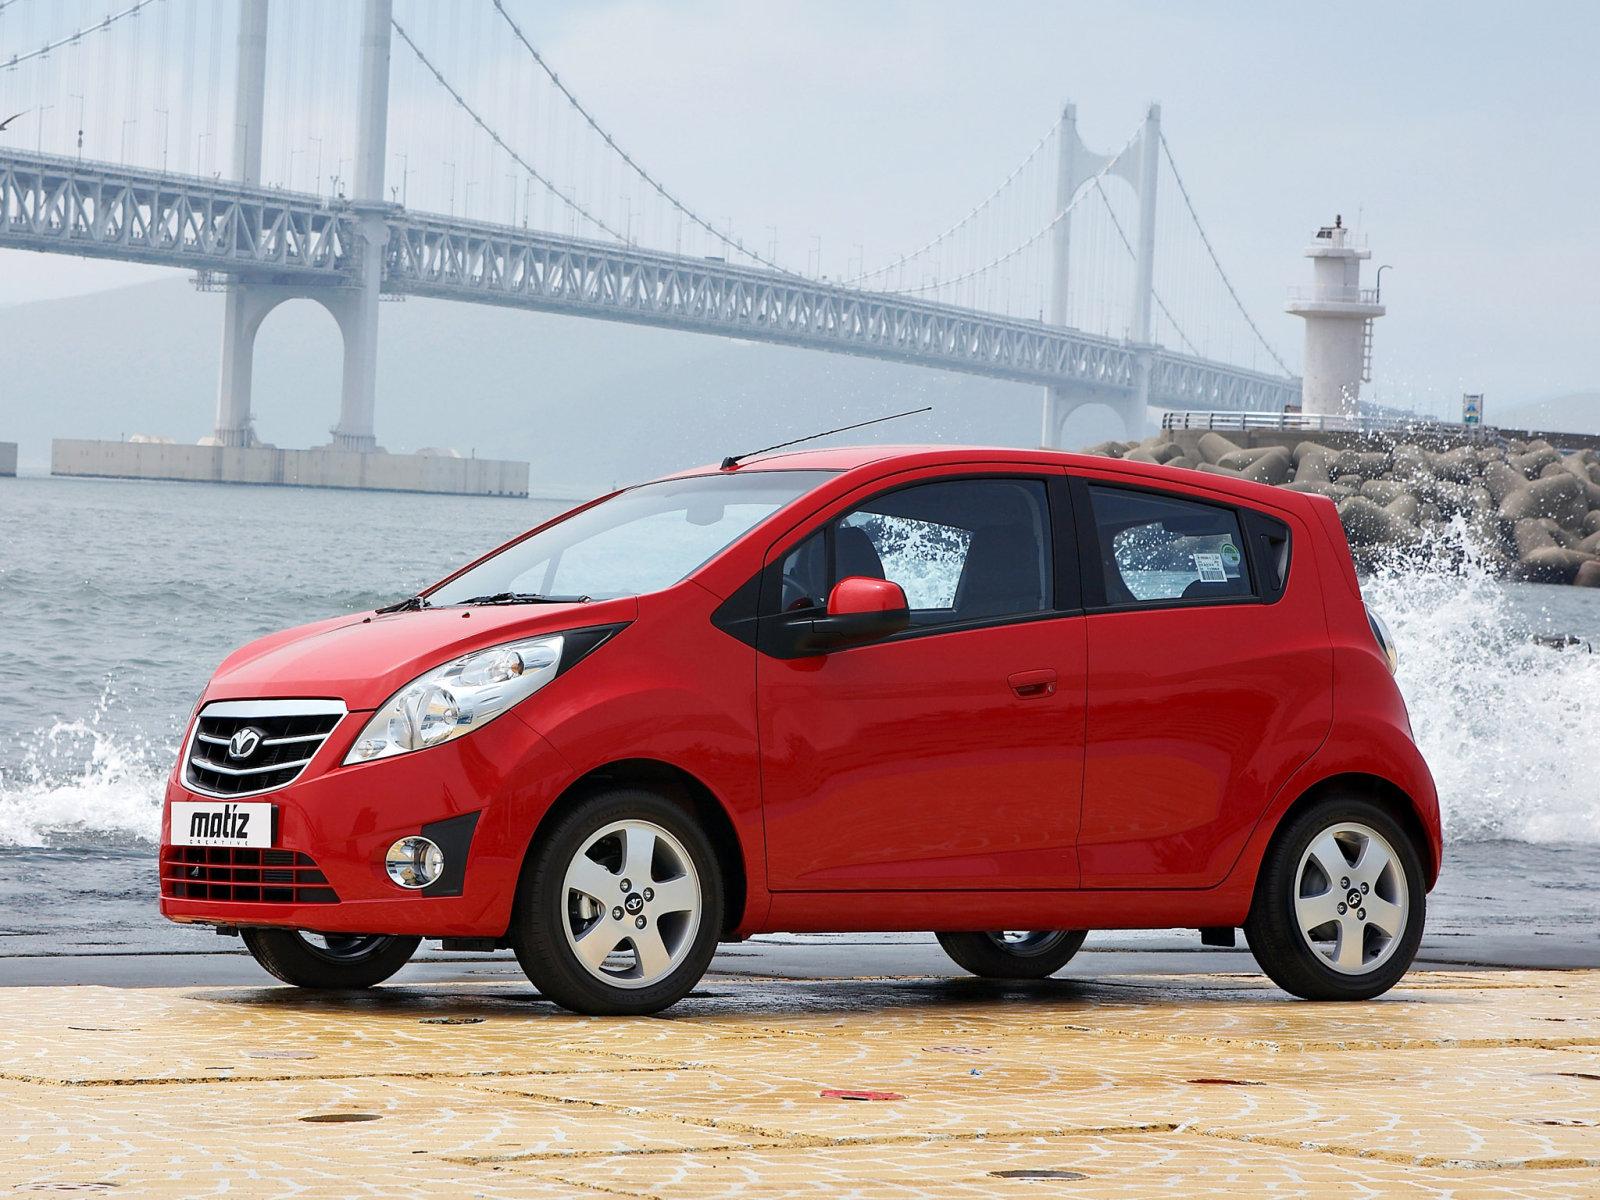 Стилистика нового кузова Daewoo Matiz